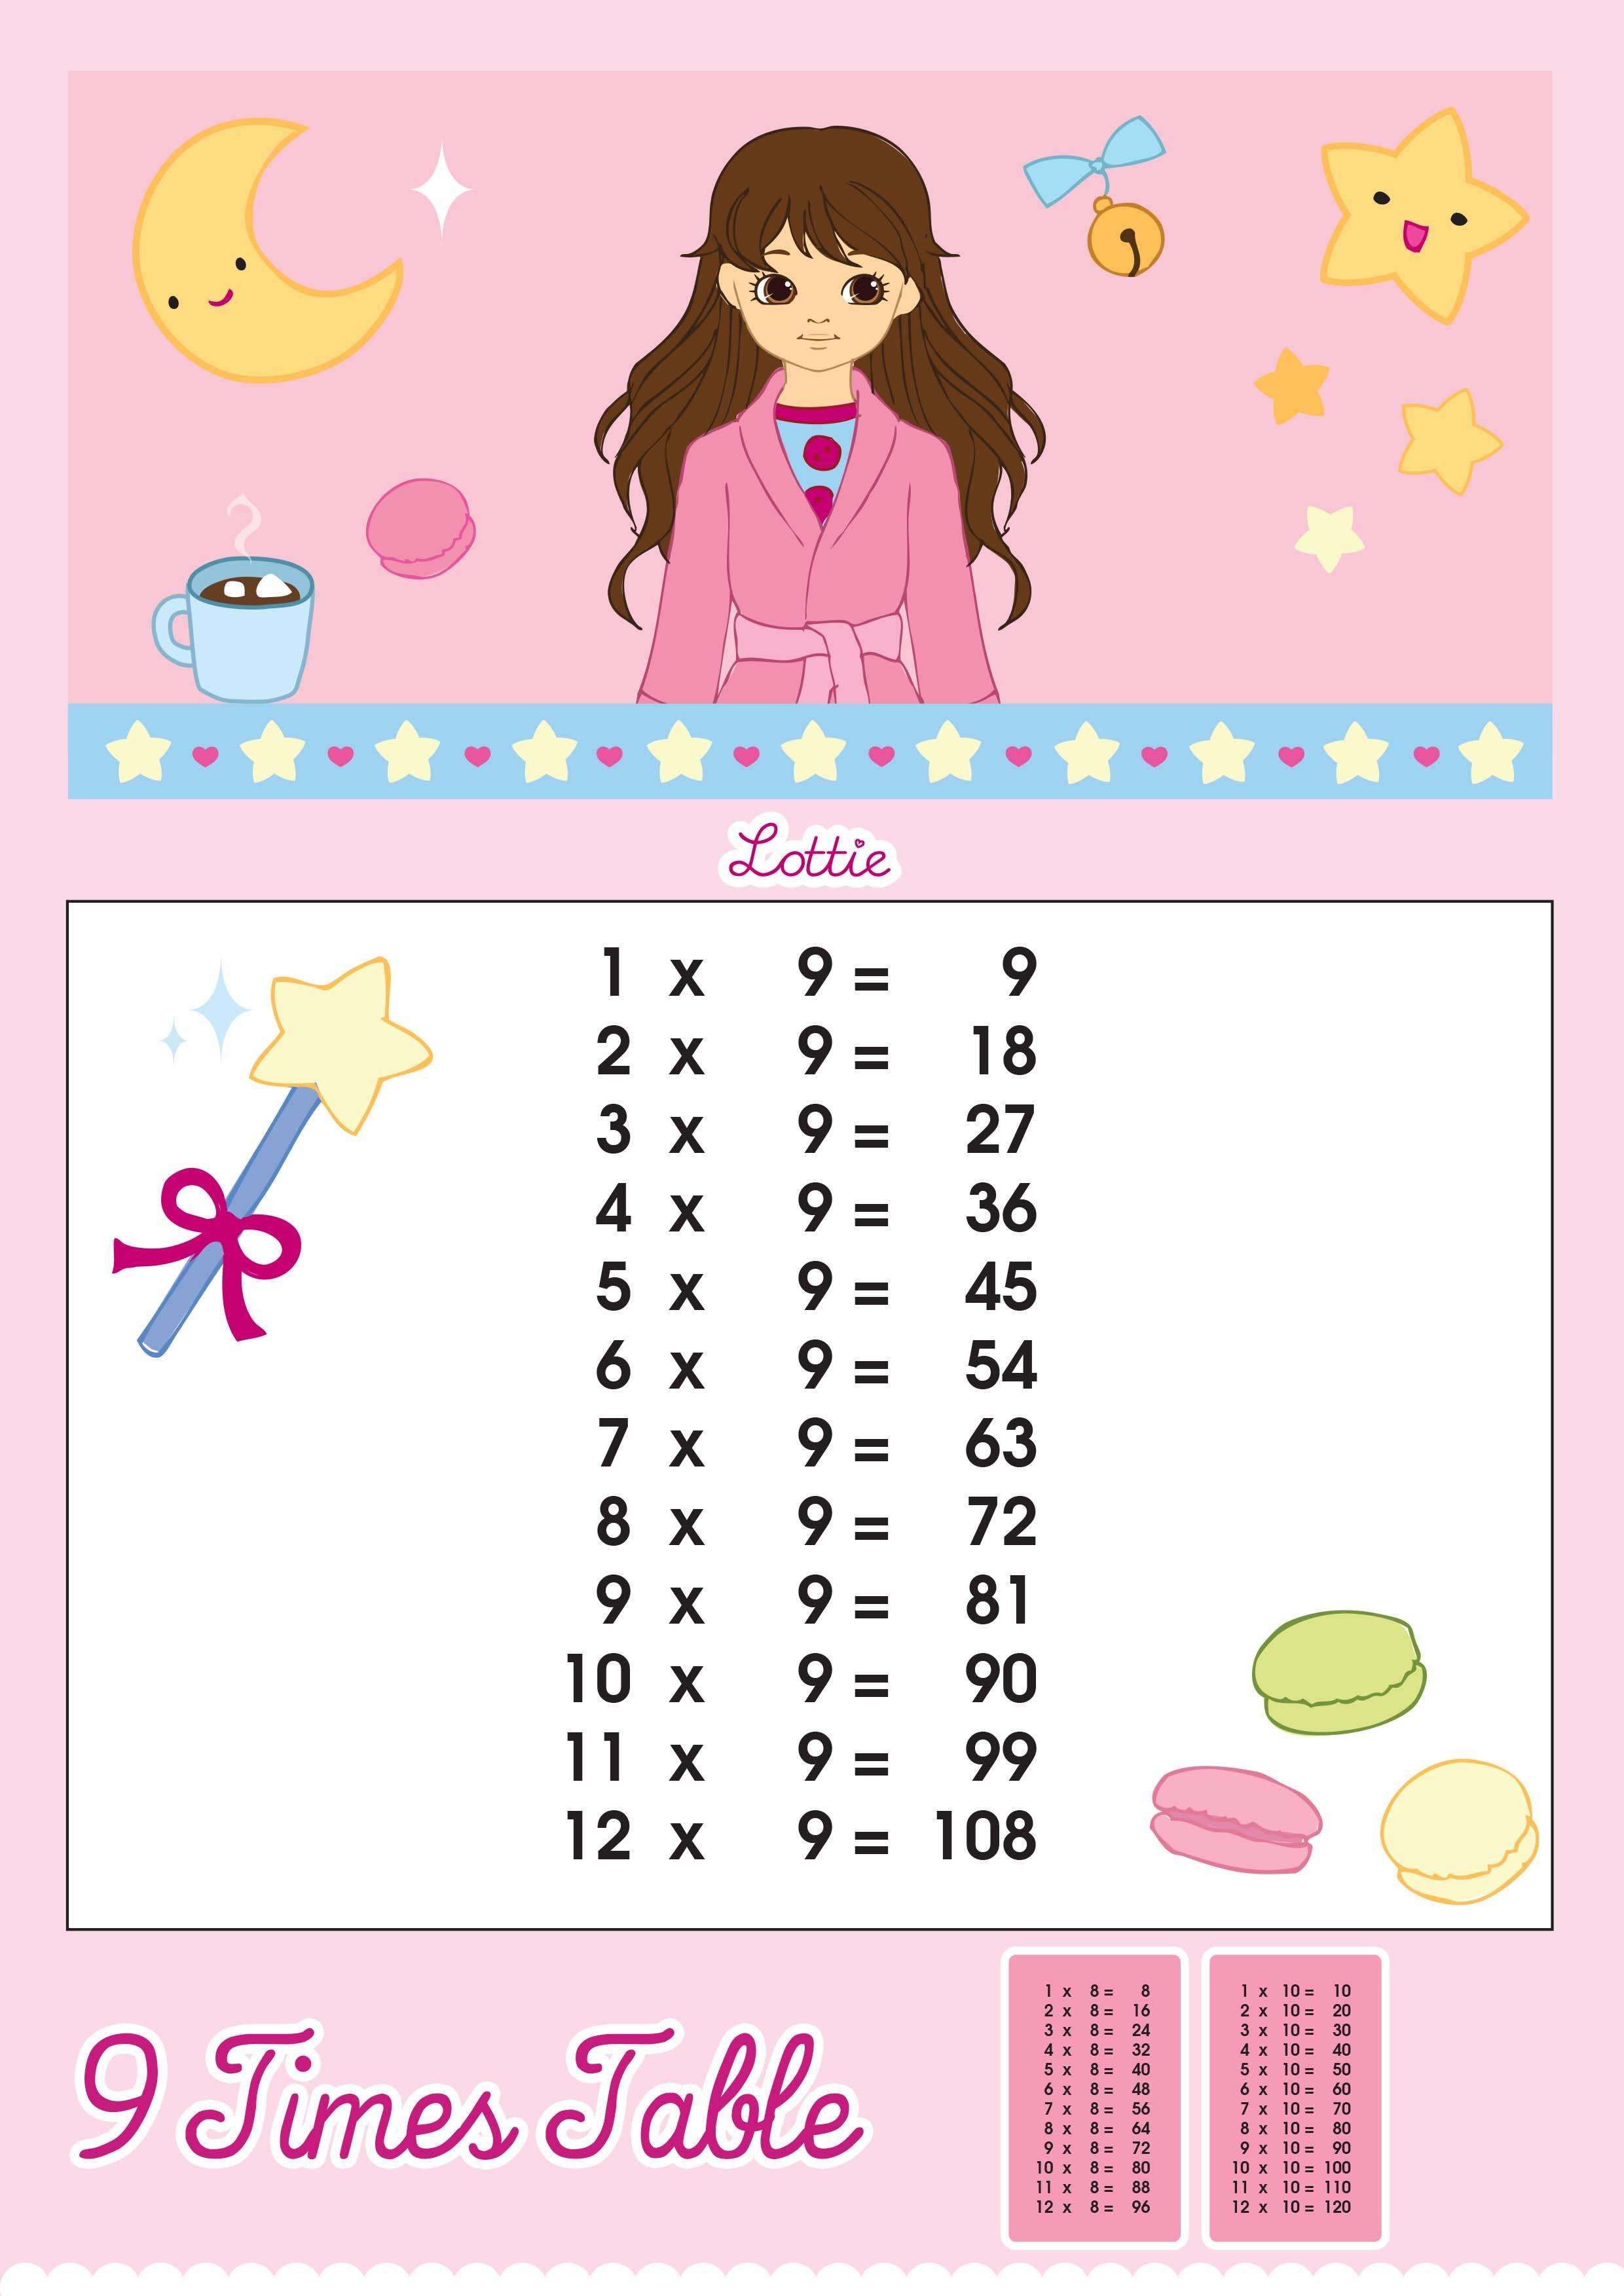 Lottie doll printable 9 times tablesg 24803507 pixels lottie doll printable 9 times tablesg 24803507 gamestrikefo Choice Image